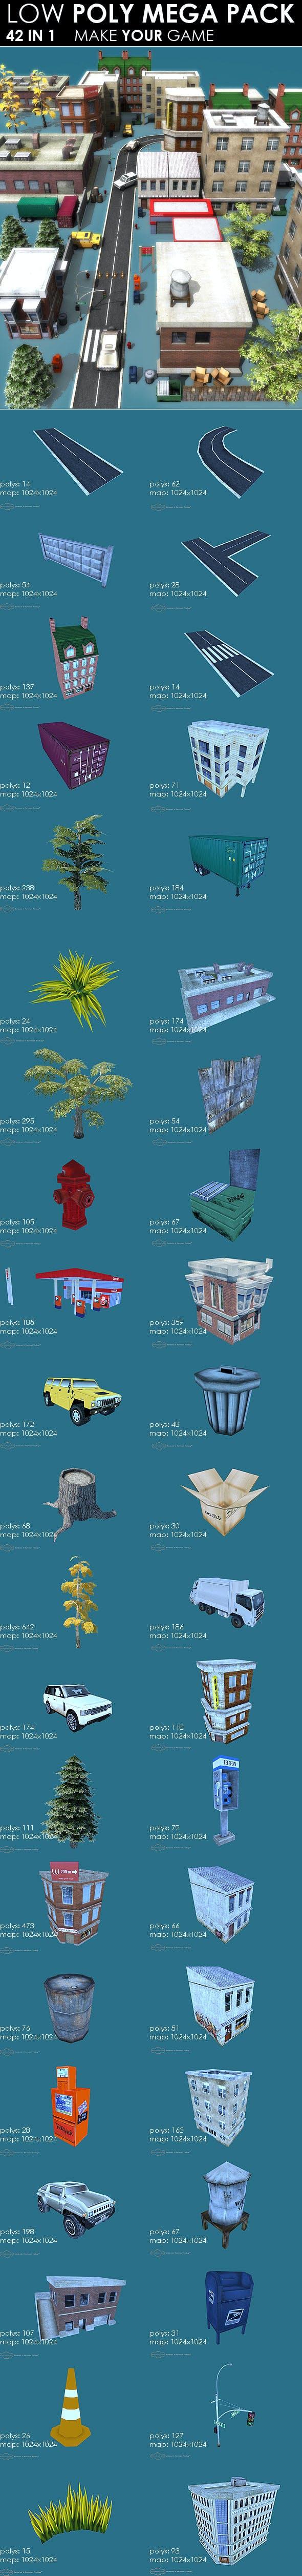 Low poly City Megapack (42 models) - 3DOcean Item for Sale